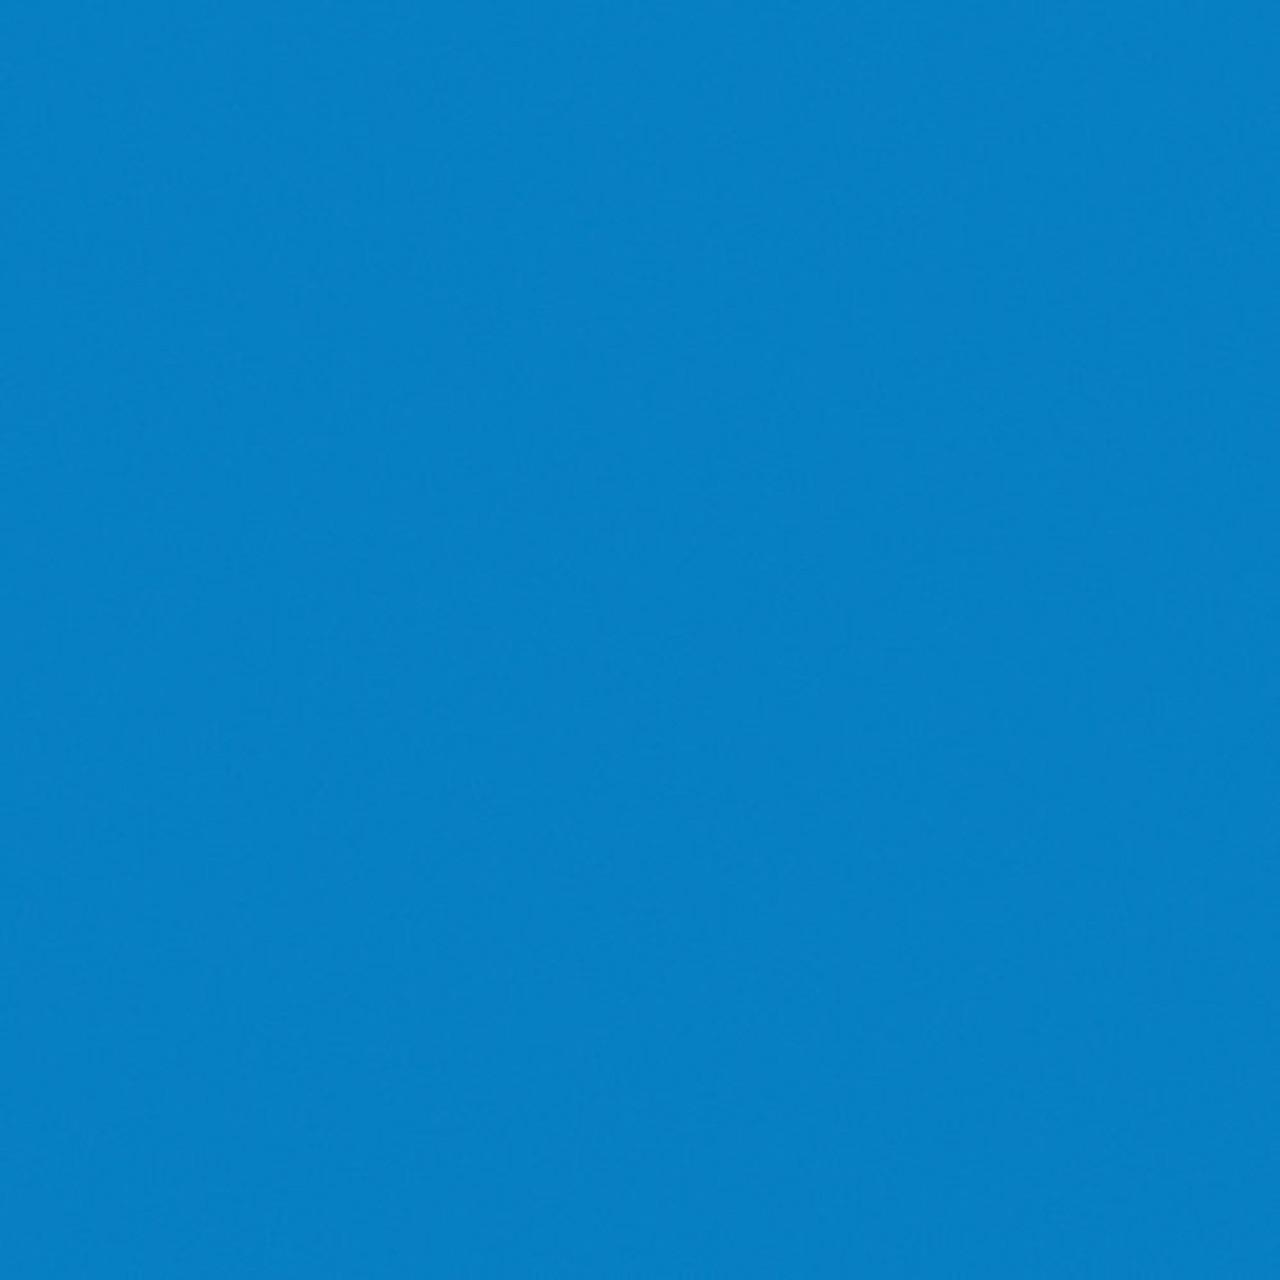 "#0365 Rosco Gels Roscolux Tharon Delft Blue, 20x24"""